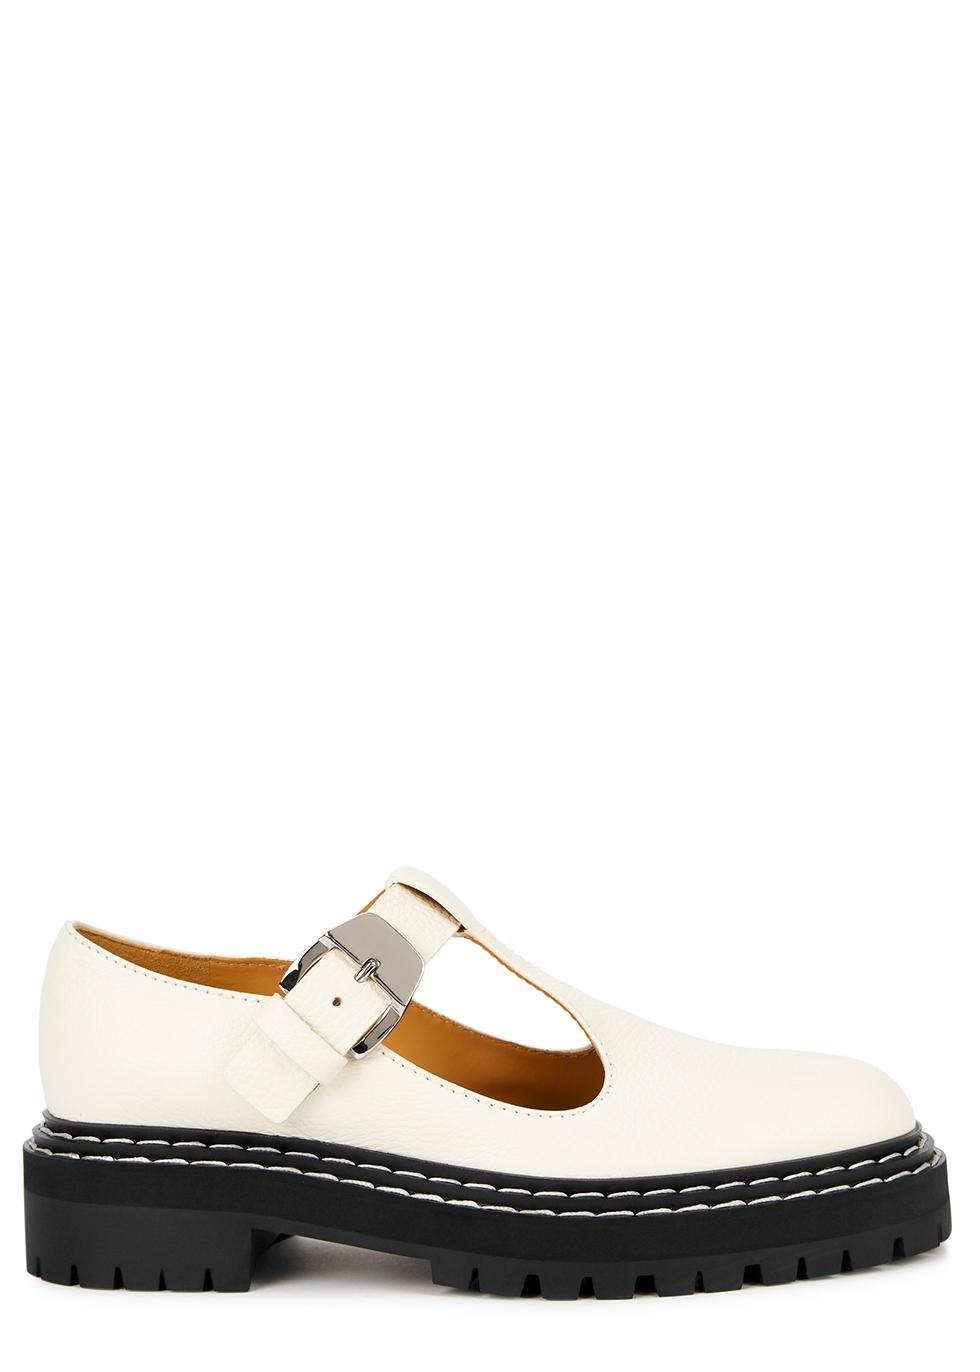 Brogues - Designer Shoes - Harvey Nichols